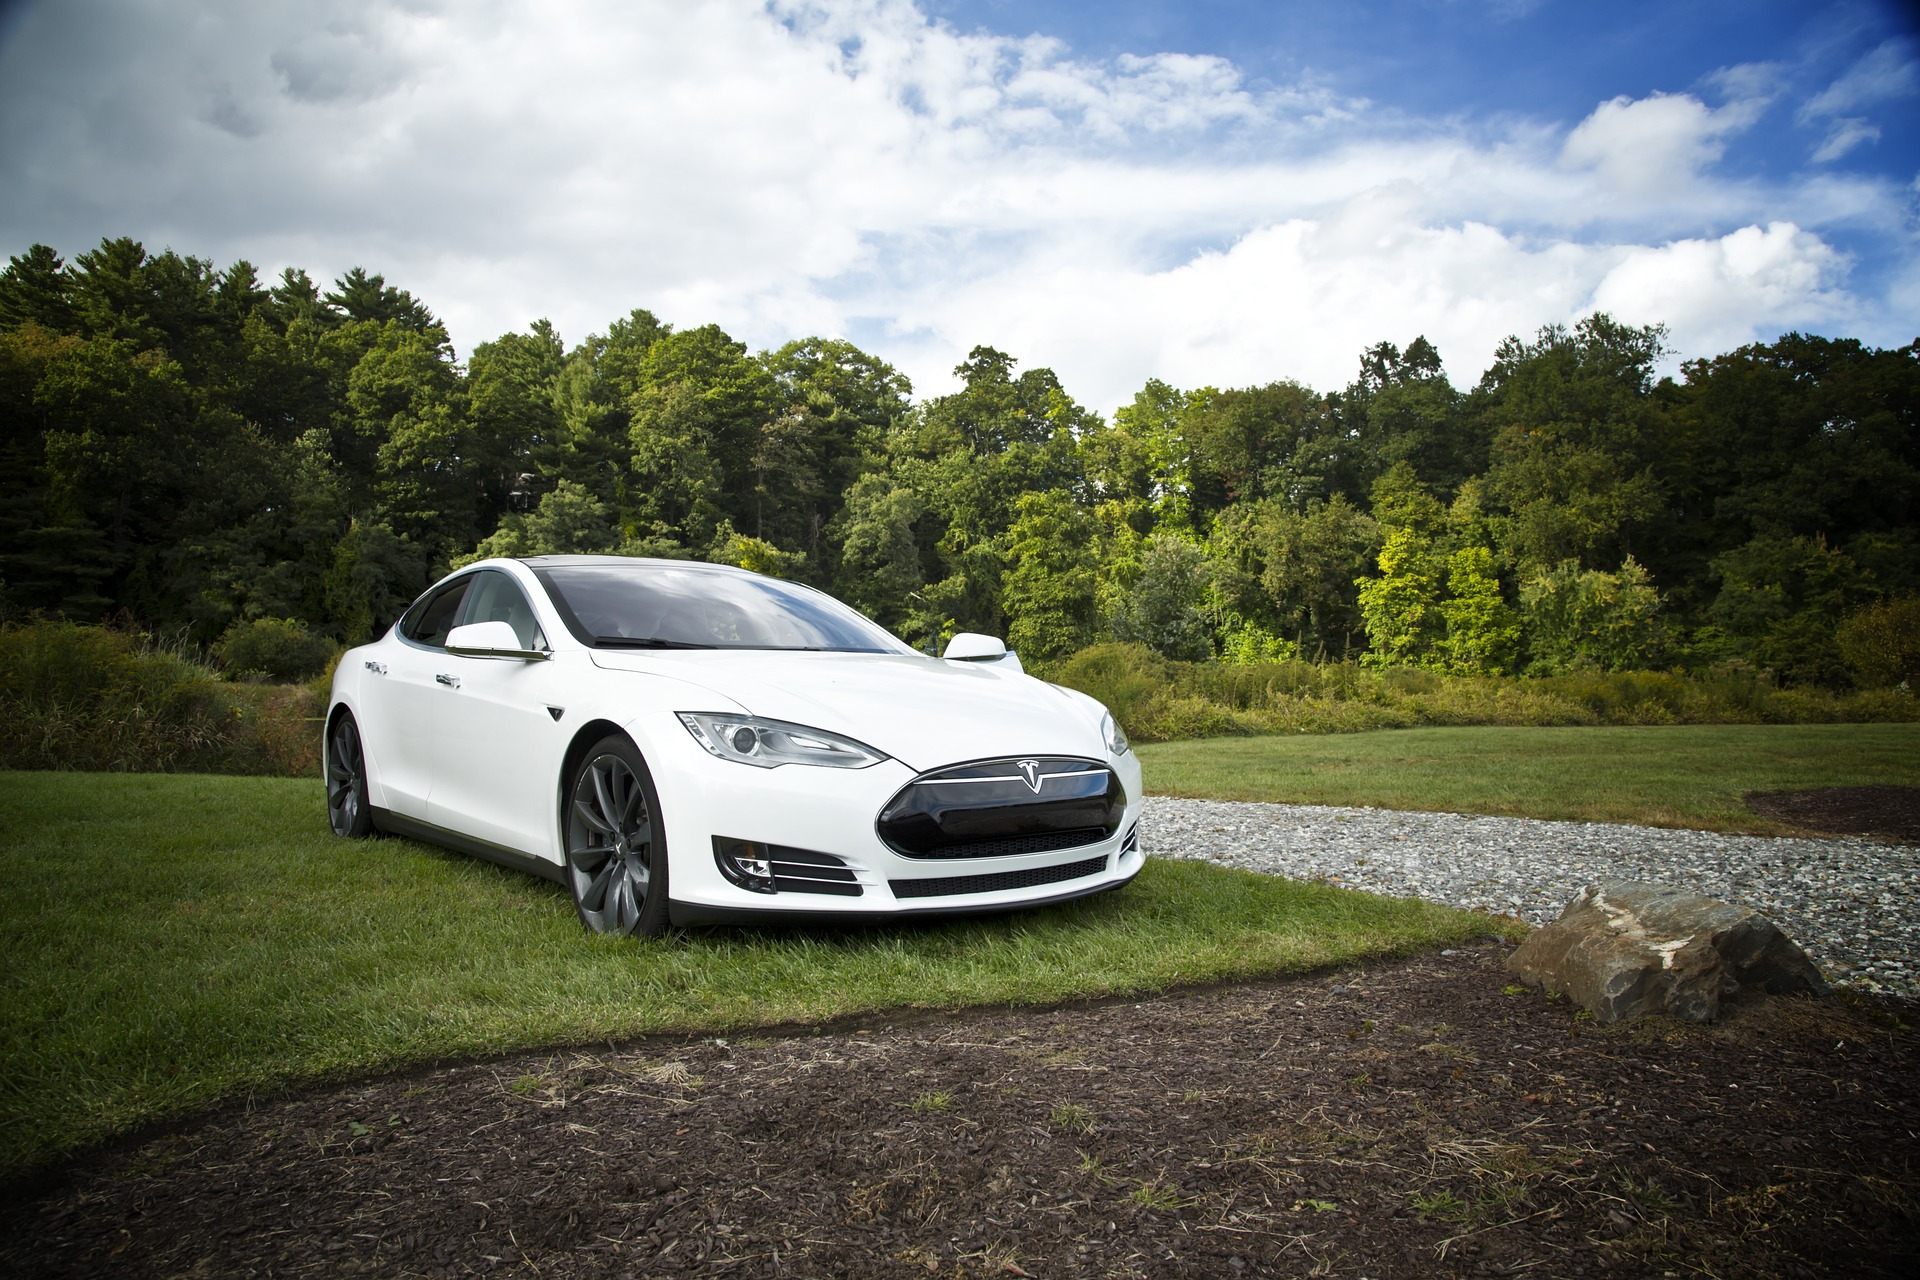 Tesla Model S, noleggia la Regina delle